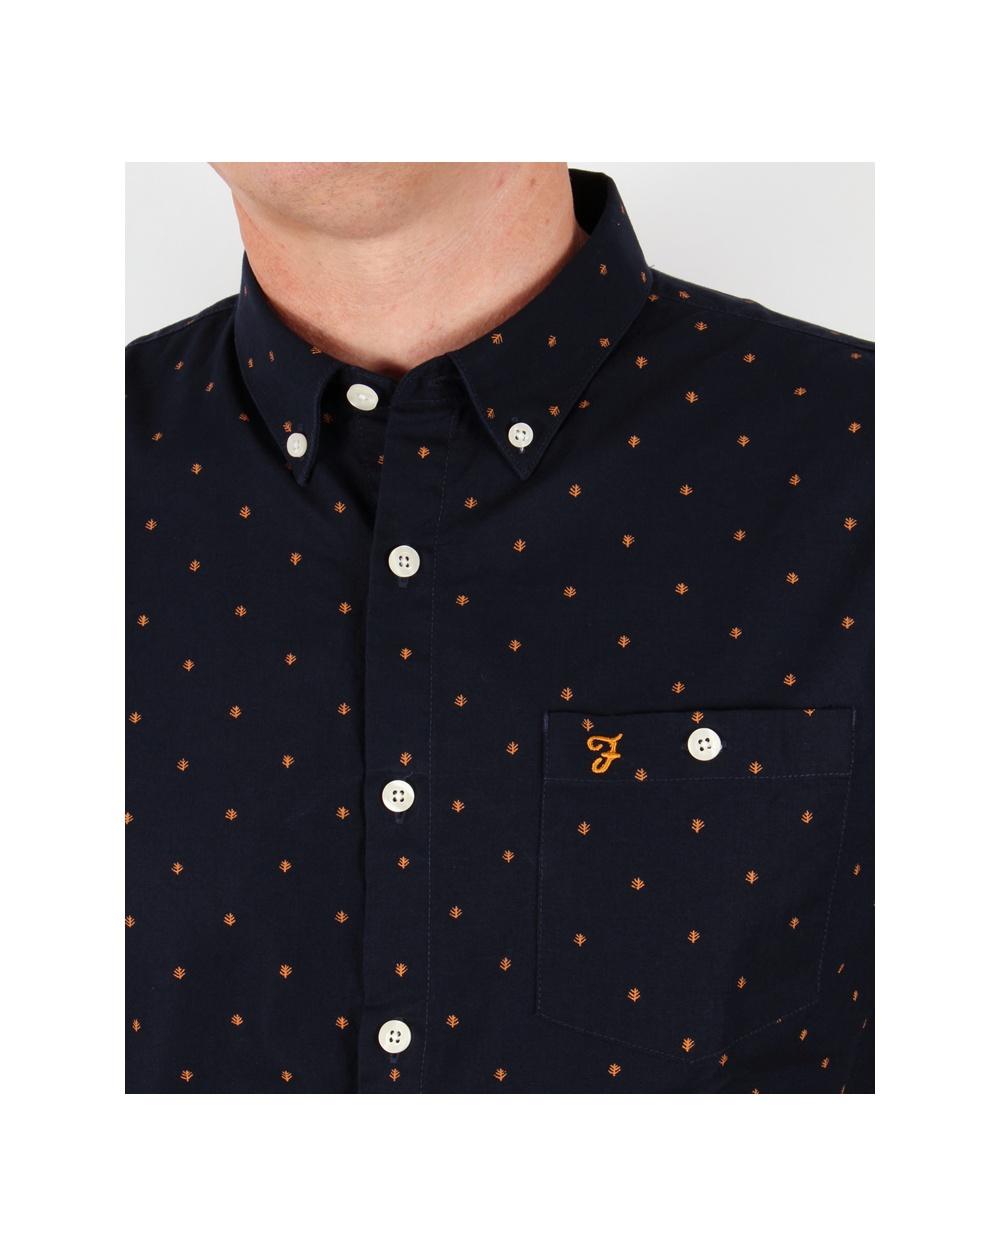 Farah Albyn Slim Fit Shirt Navy Cotton Button Down Collar Mens